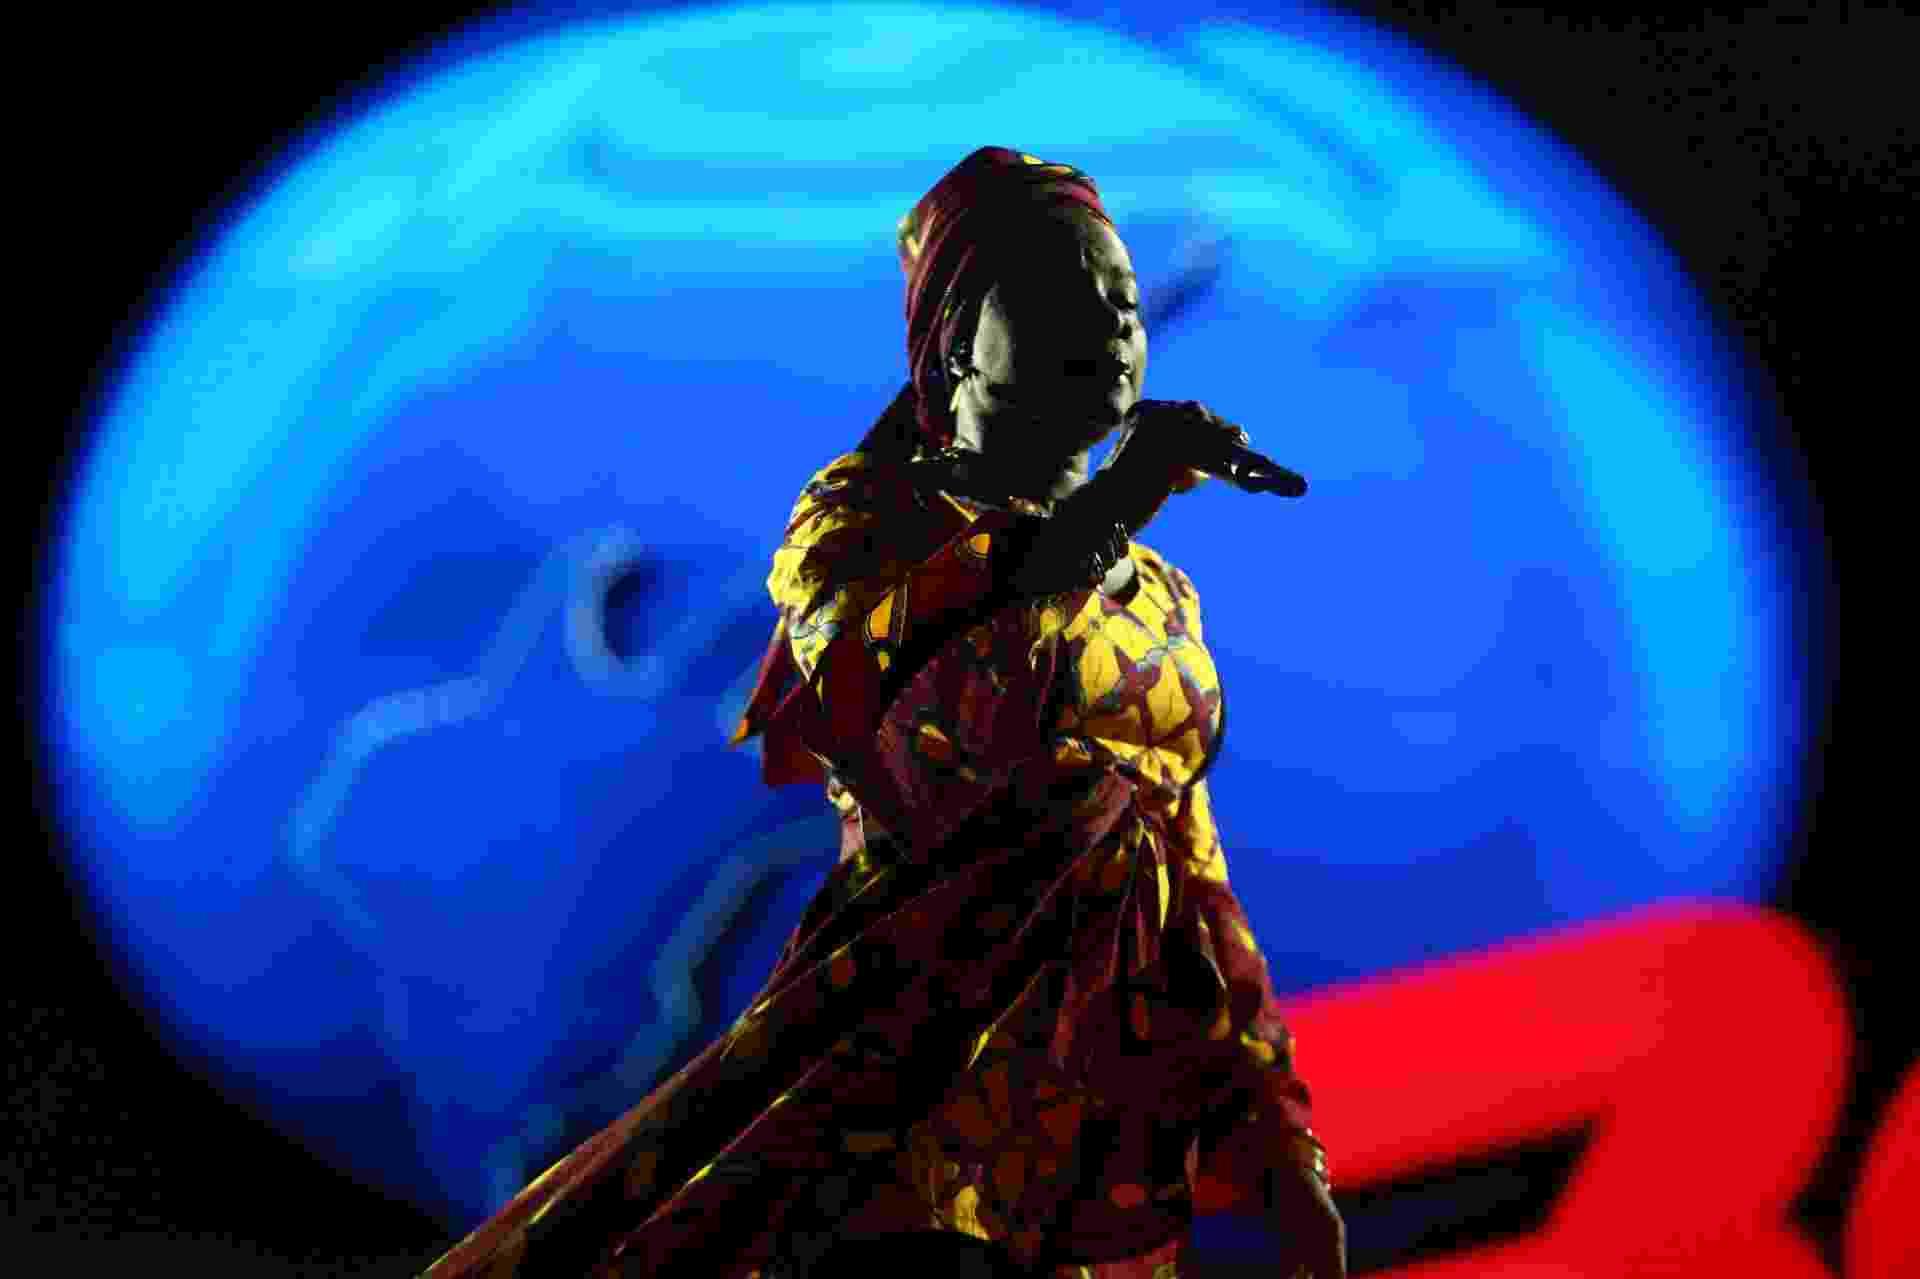 26.set.2016 - A cantora africana Angelique Kidjo no palco Sunset, durante o sexto dia do festival Rock in Rio 2015 - Wilton Junior/Agência Estado